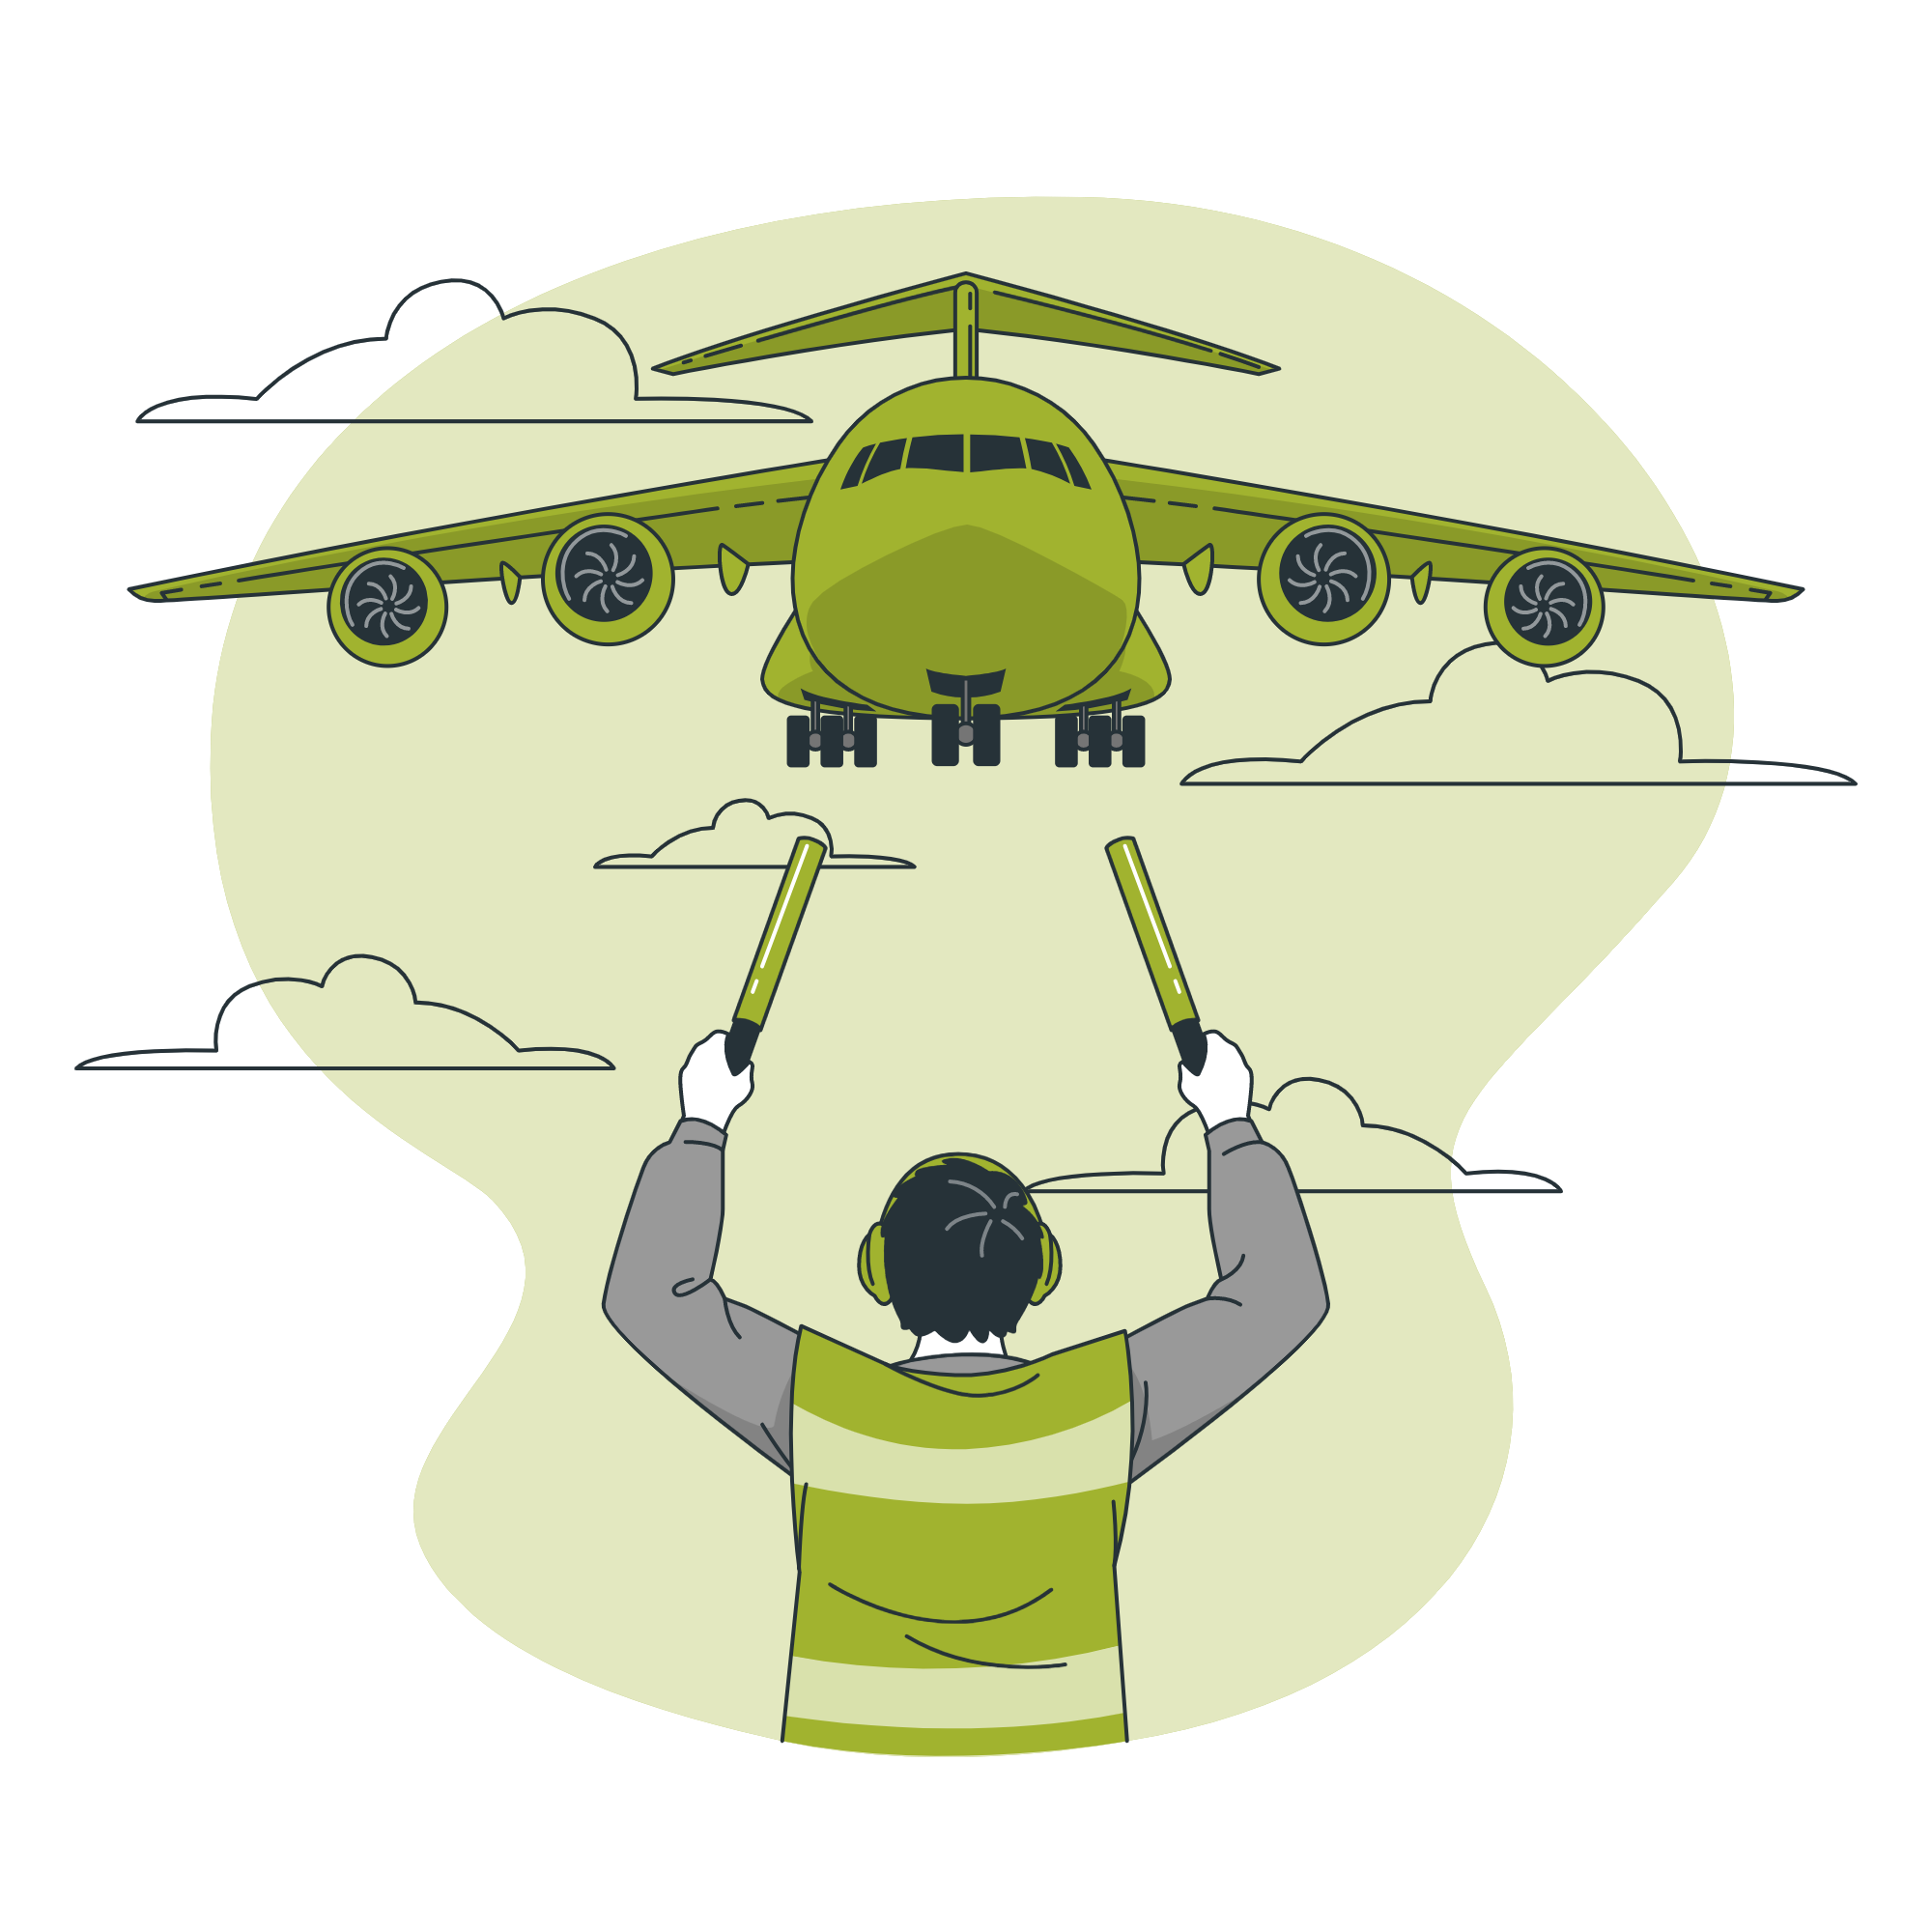 Aircraft-bro